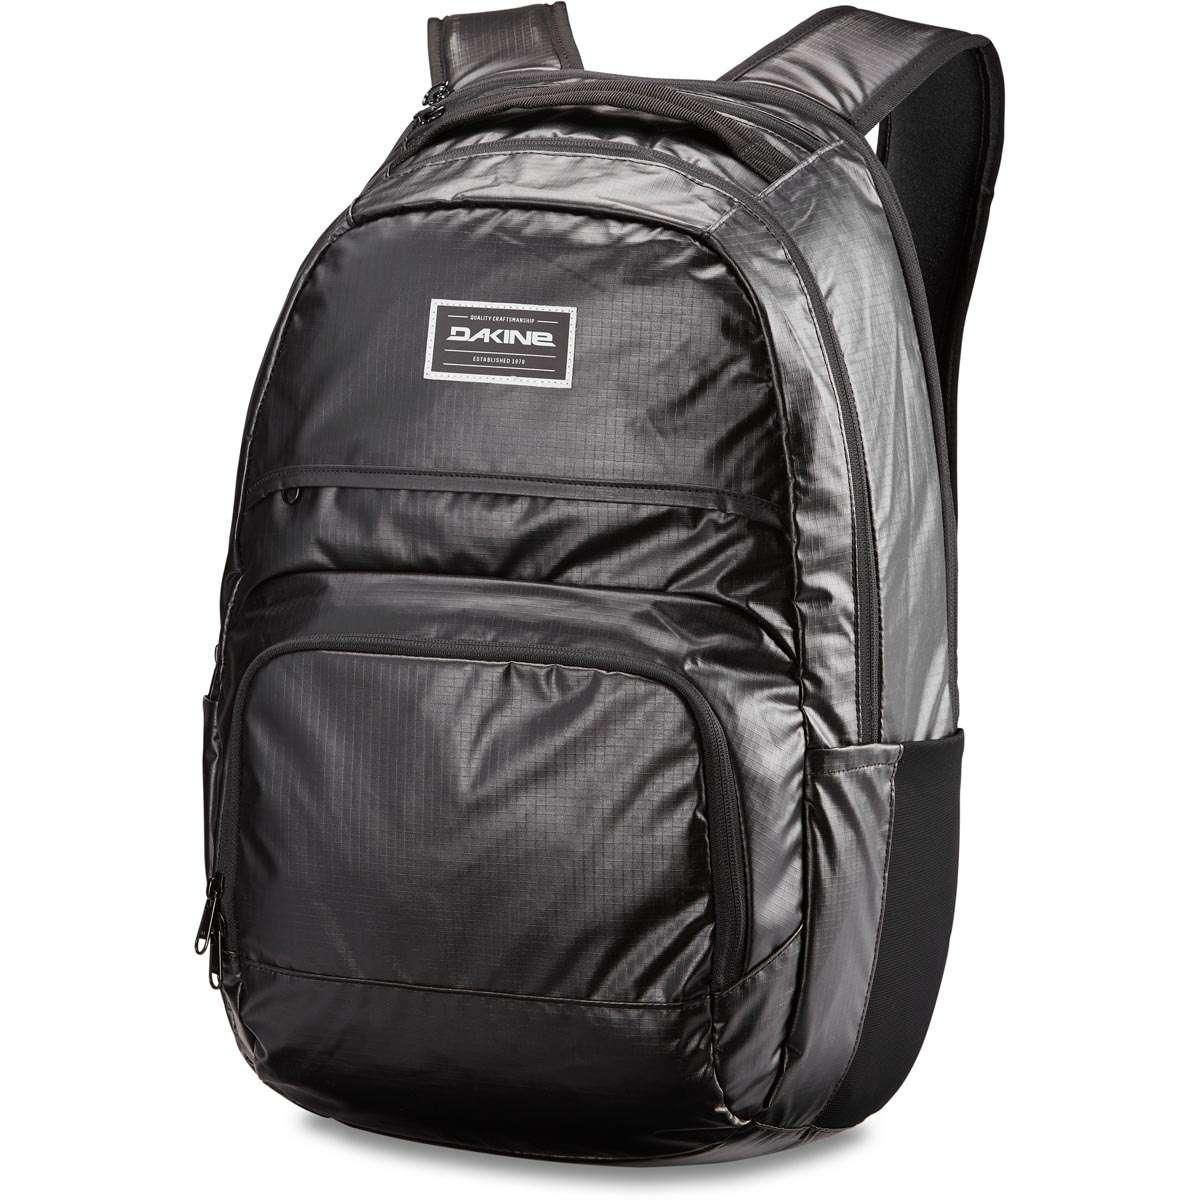 2cc079e9052a9 Dakine Campus DLX 33L Backpack Storm